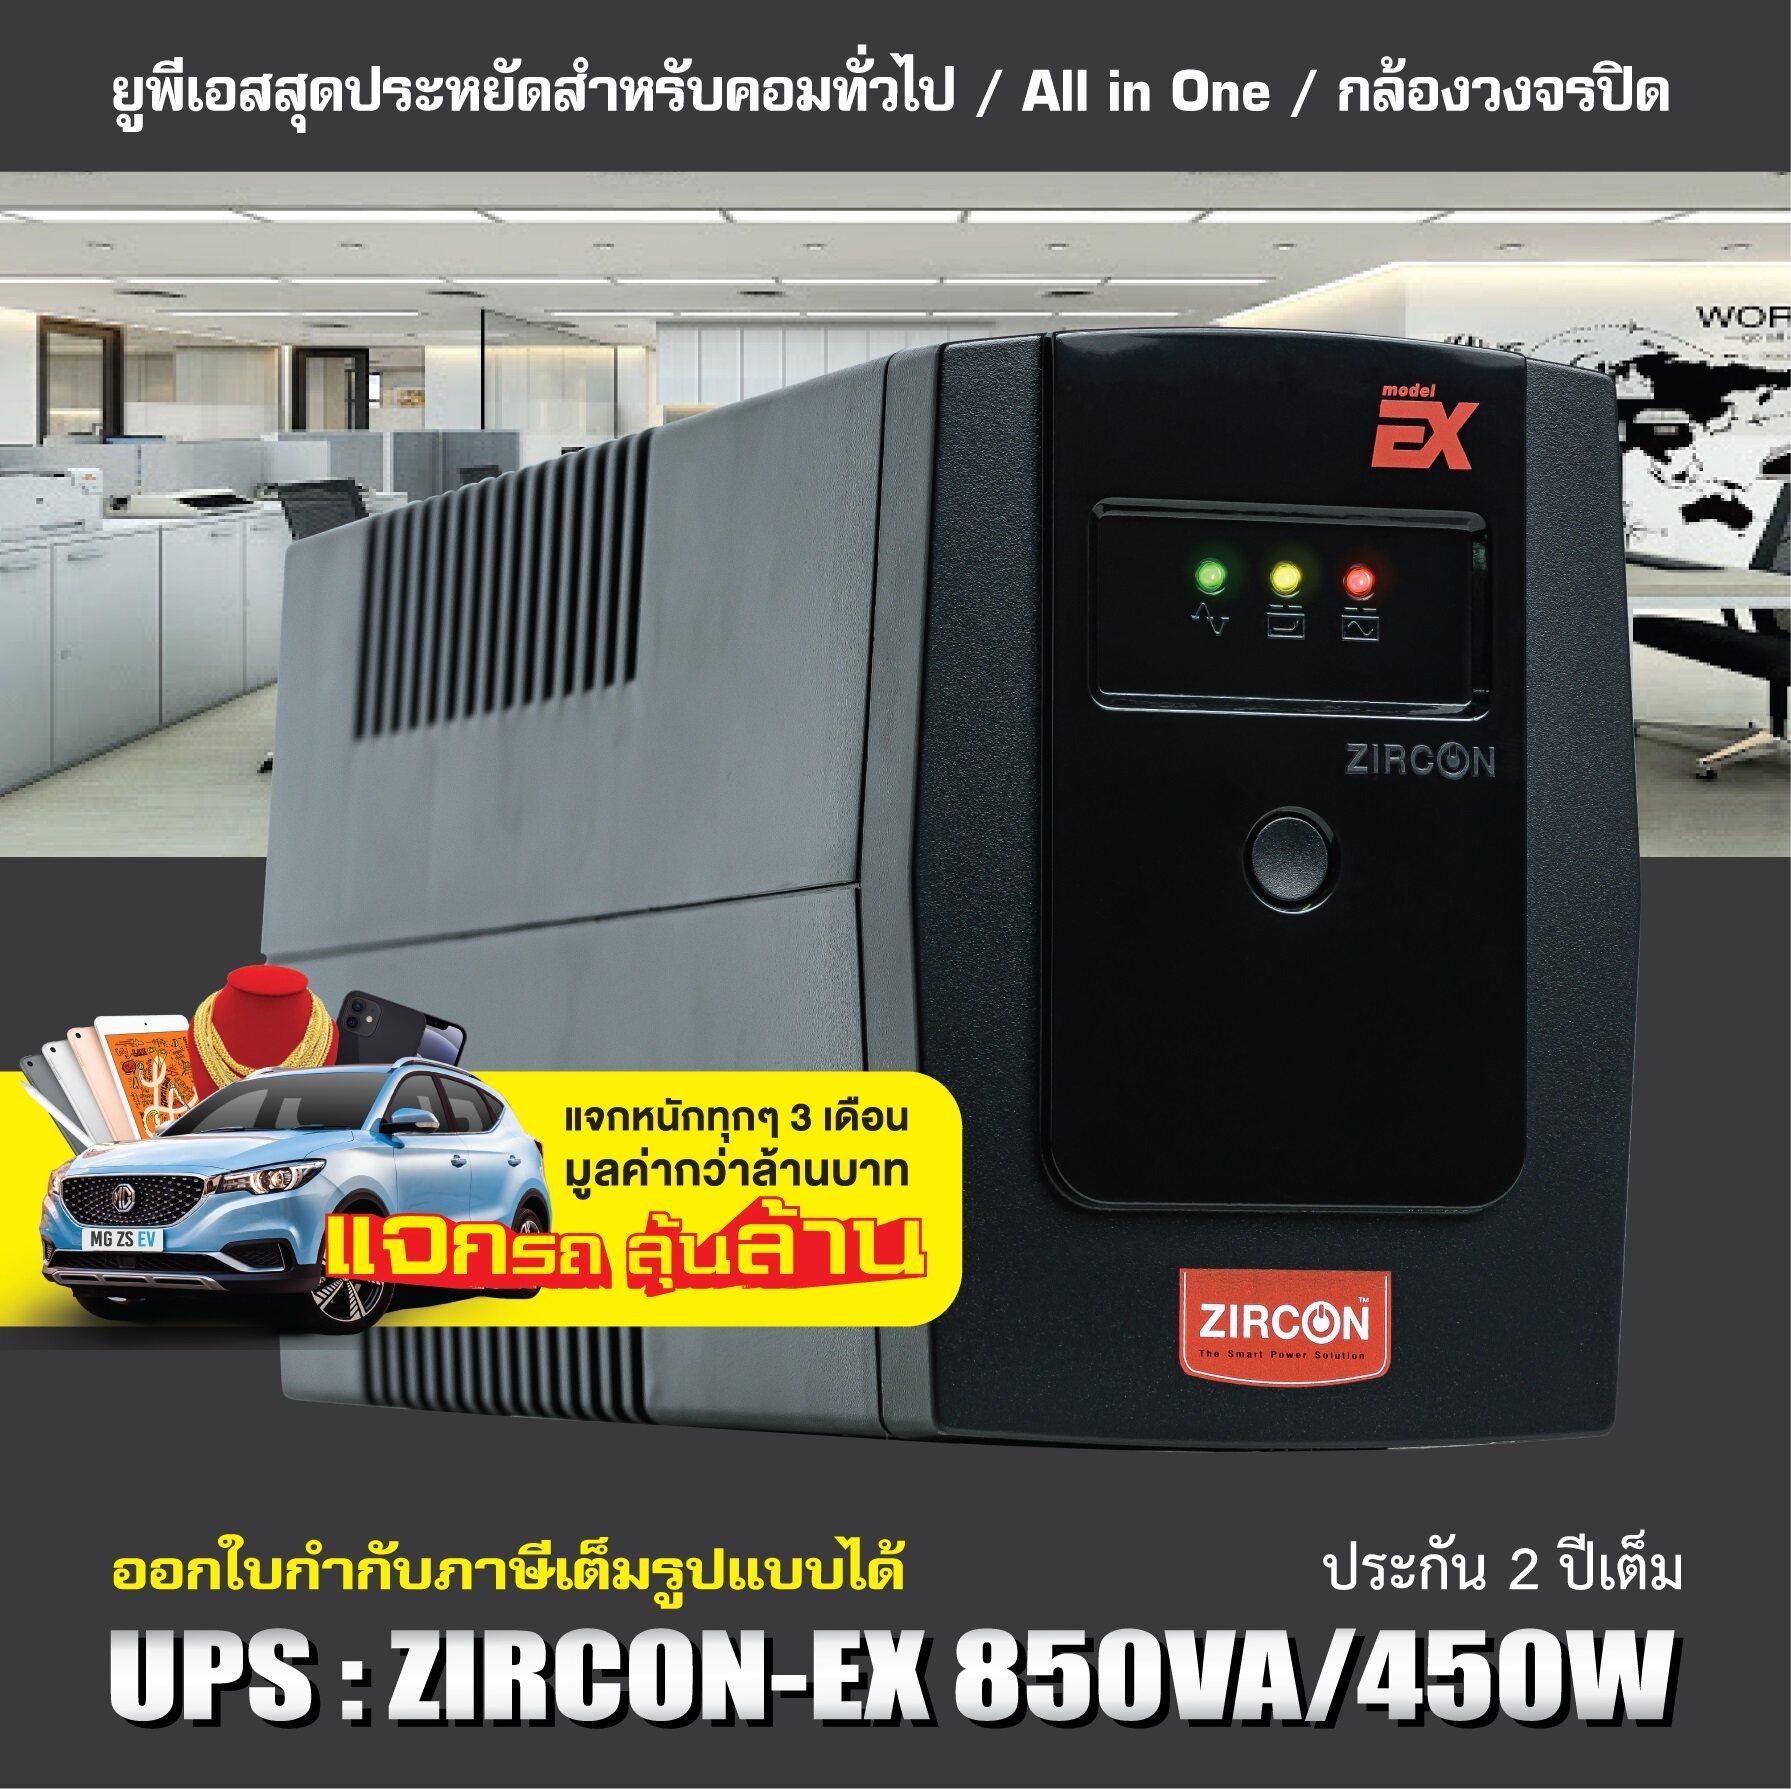 Big-Sale! Ex-850va-Ups มือหนึ่งสุดประหยัด เหมาะกับคอมพิวเตอร์ทั่วไป คอมออลอินวัน ประกัน2ปี [zirconแจกรถลุ้นล้าน].